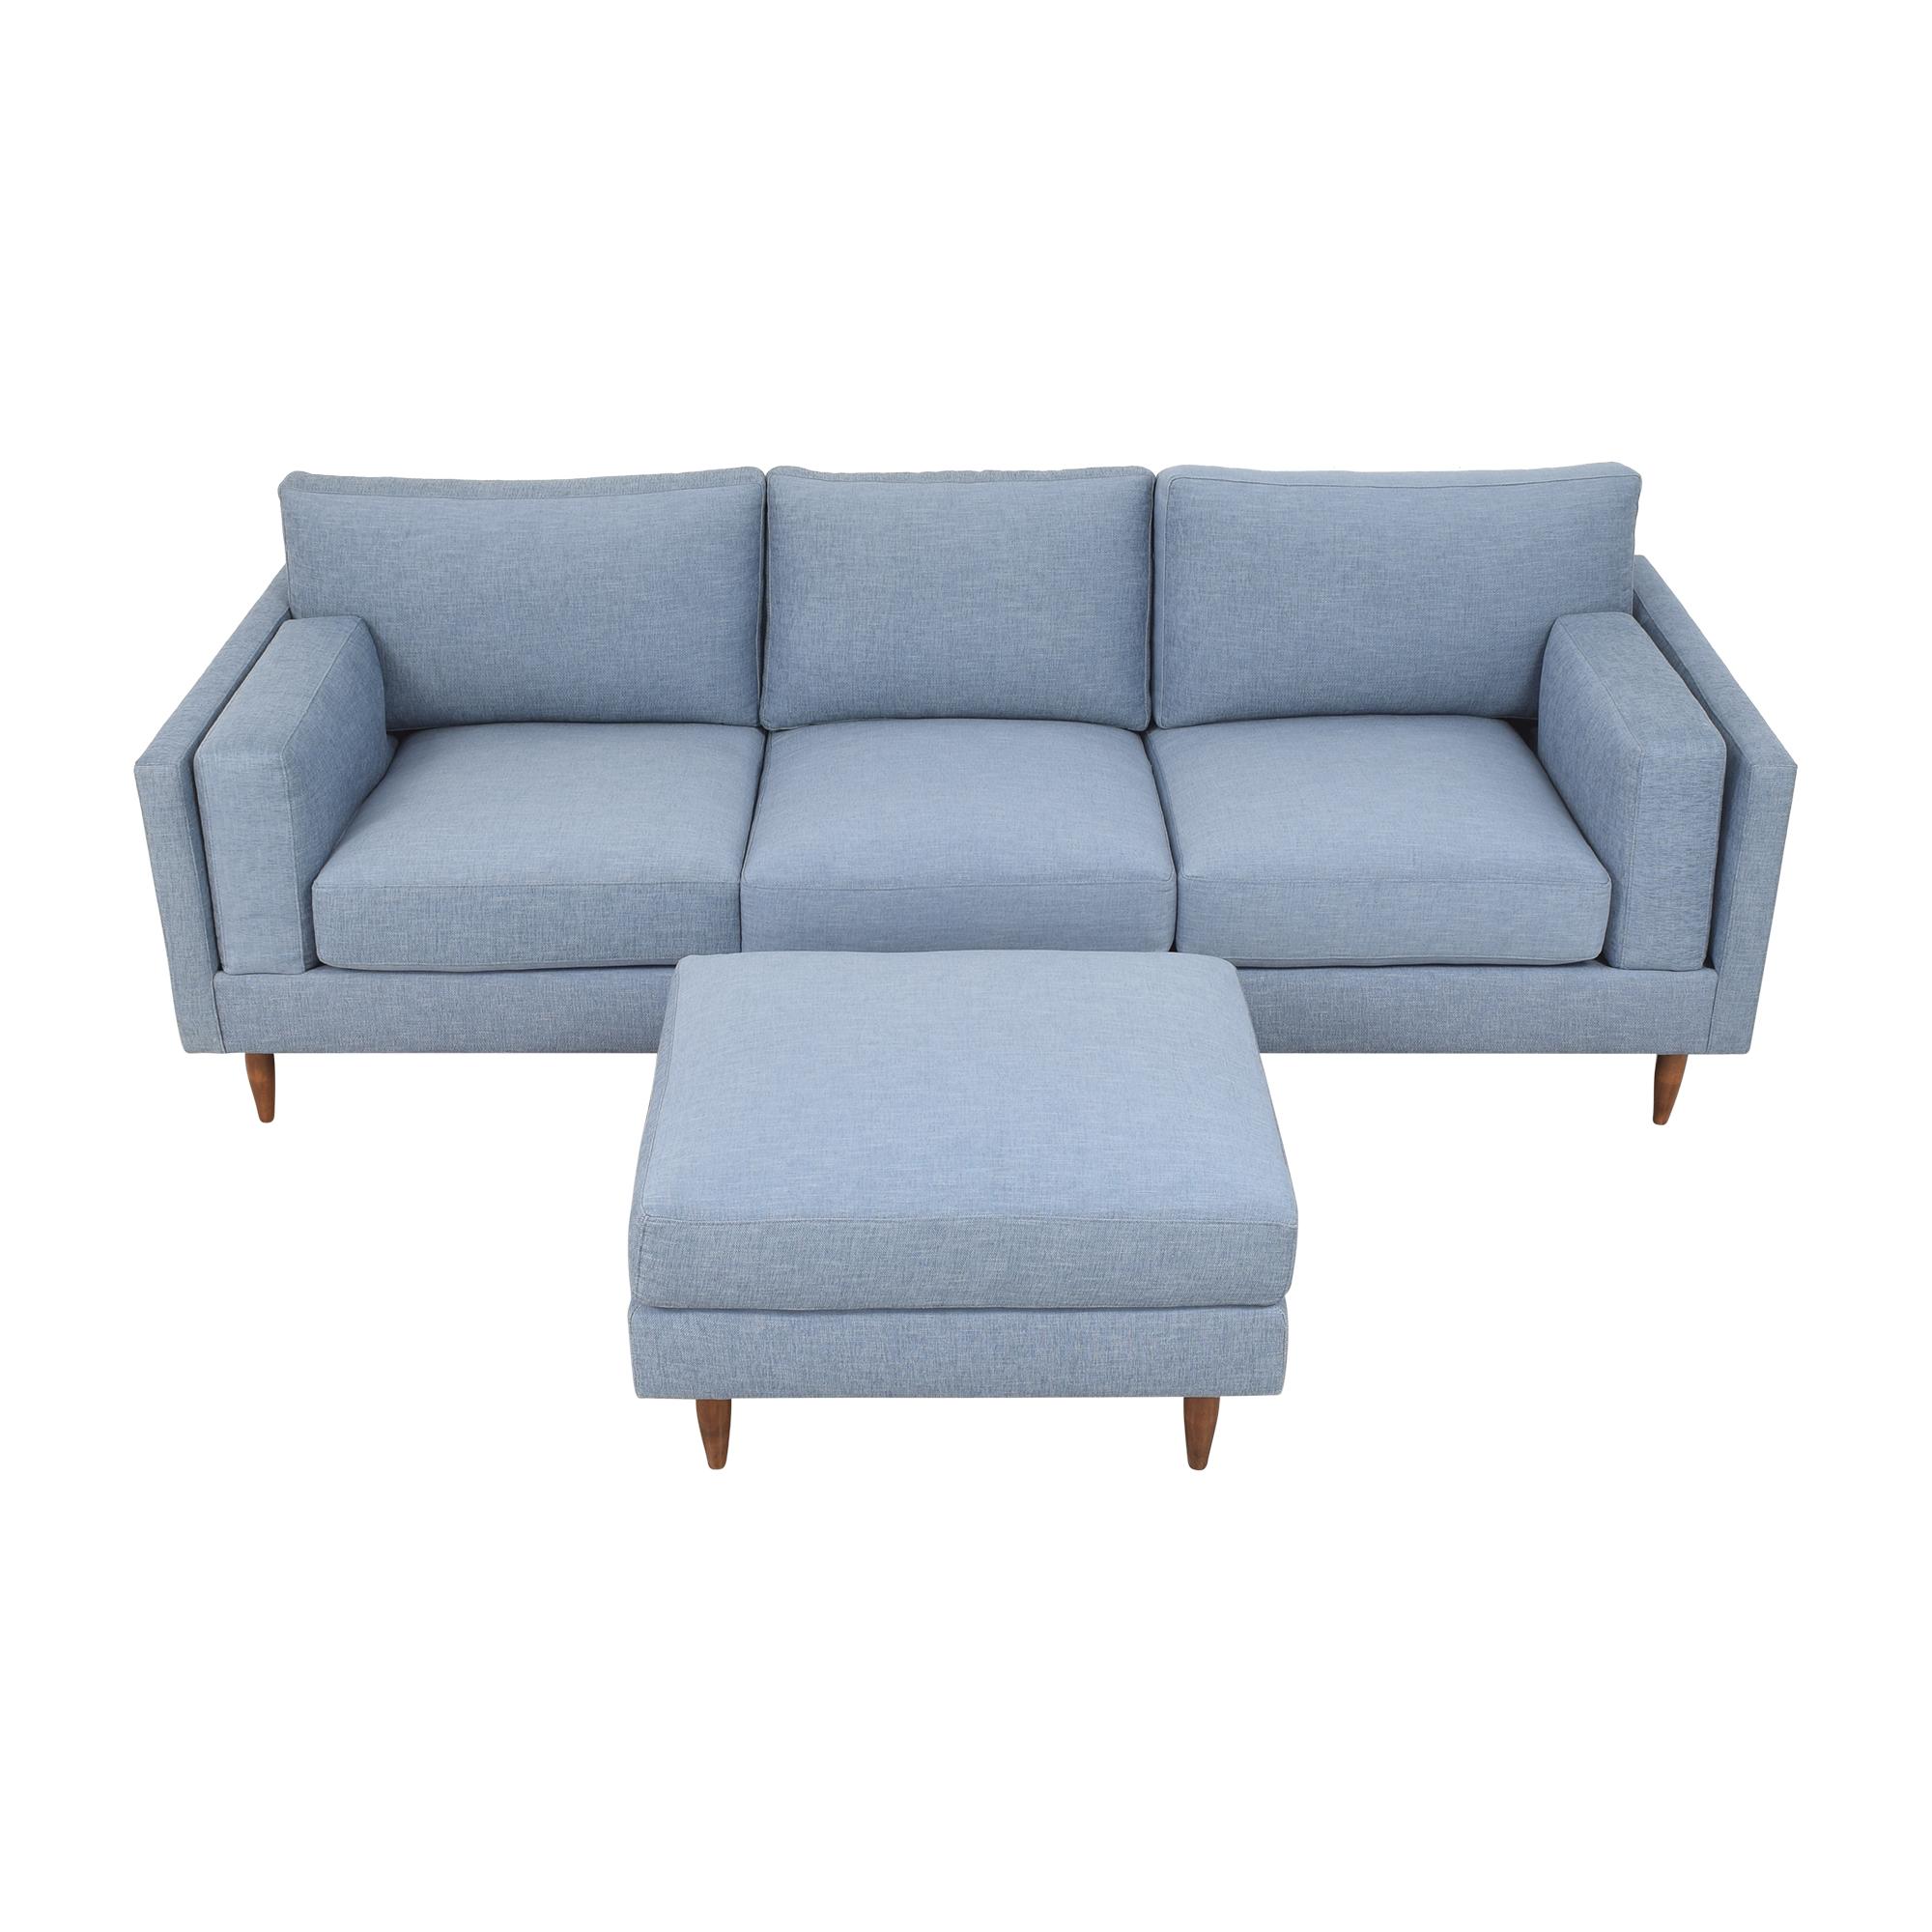 BenchMade Modern BenchMade Modern Skinny Fat Sofa with Ottoman on sale